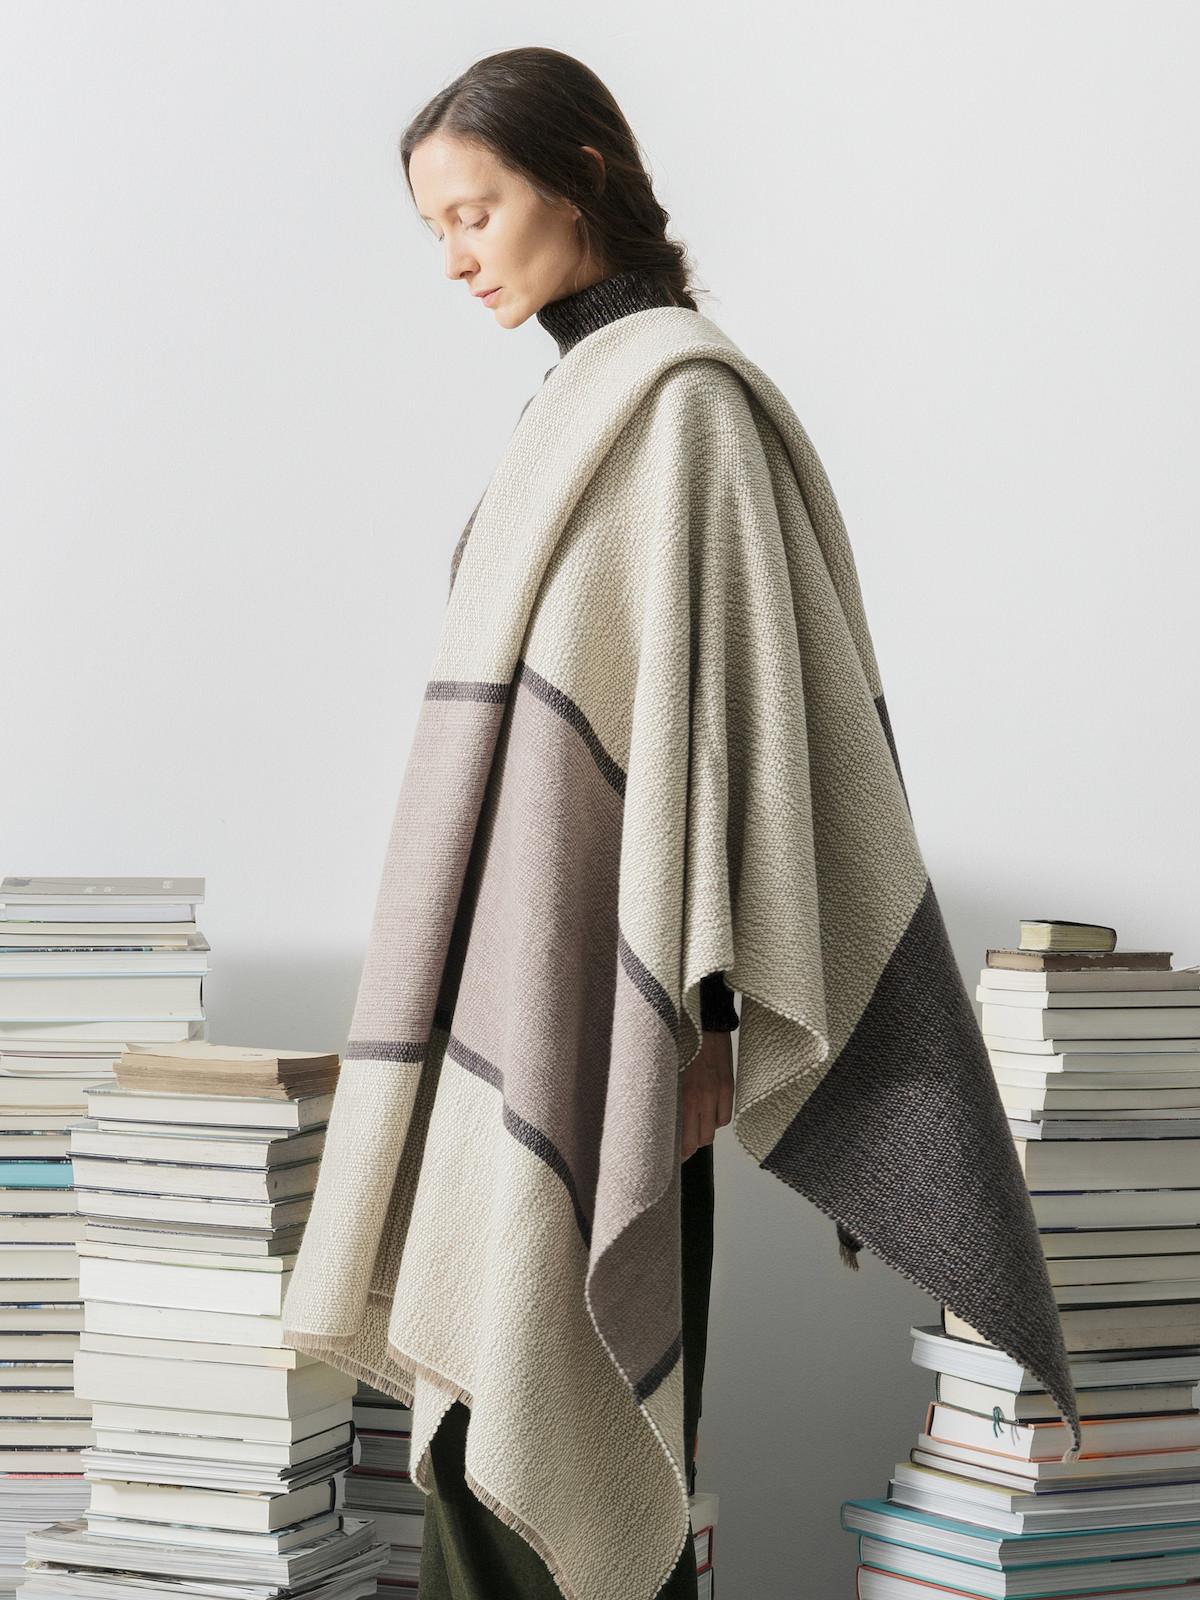 Handloomed blanket